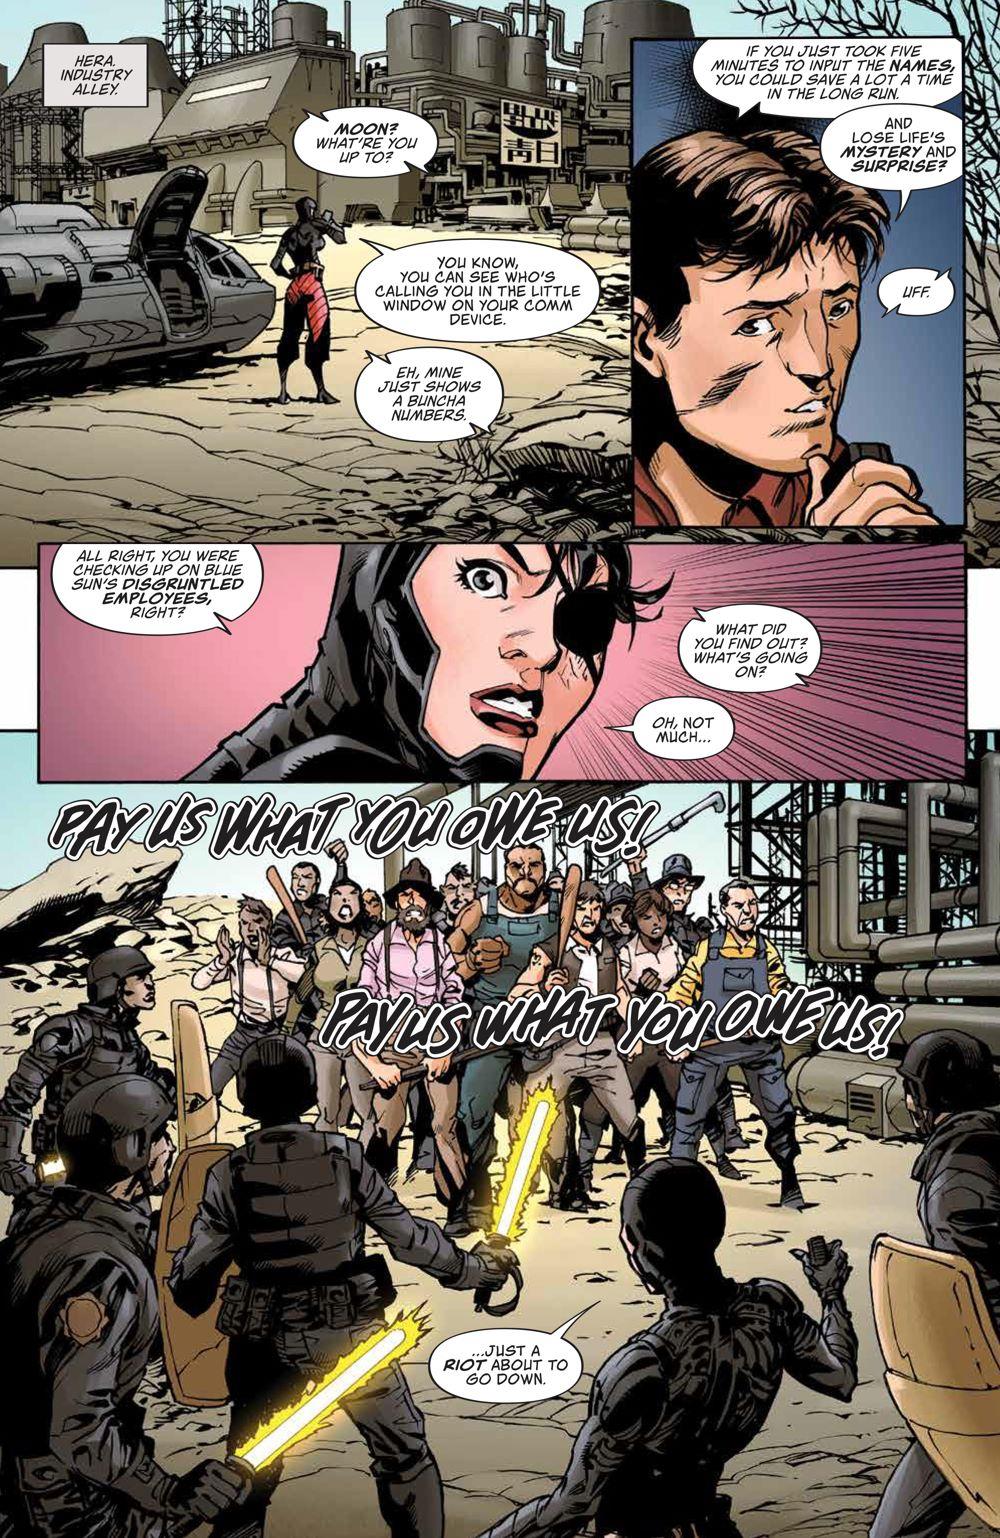 Firefly_NewSheriffVerse_v2_HC_PRESS_14 ComicList Previews: FIREFLY NEW SHERIFF IN THE 'VERSE VOLUME 2 HC